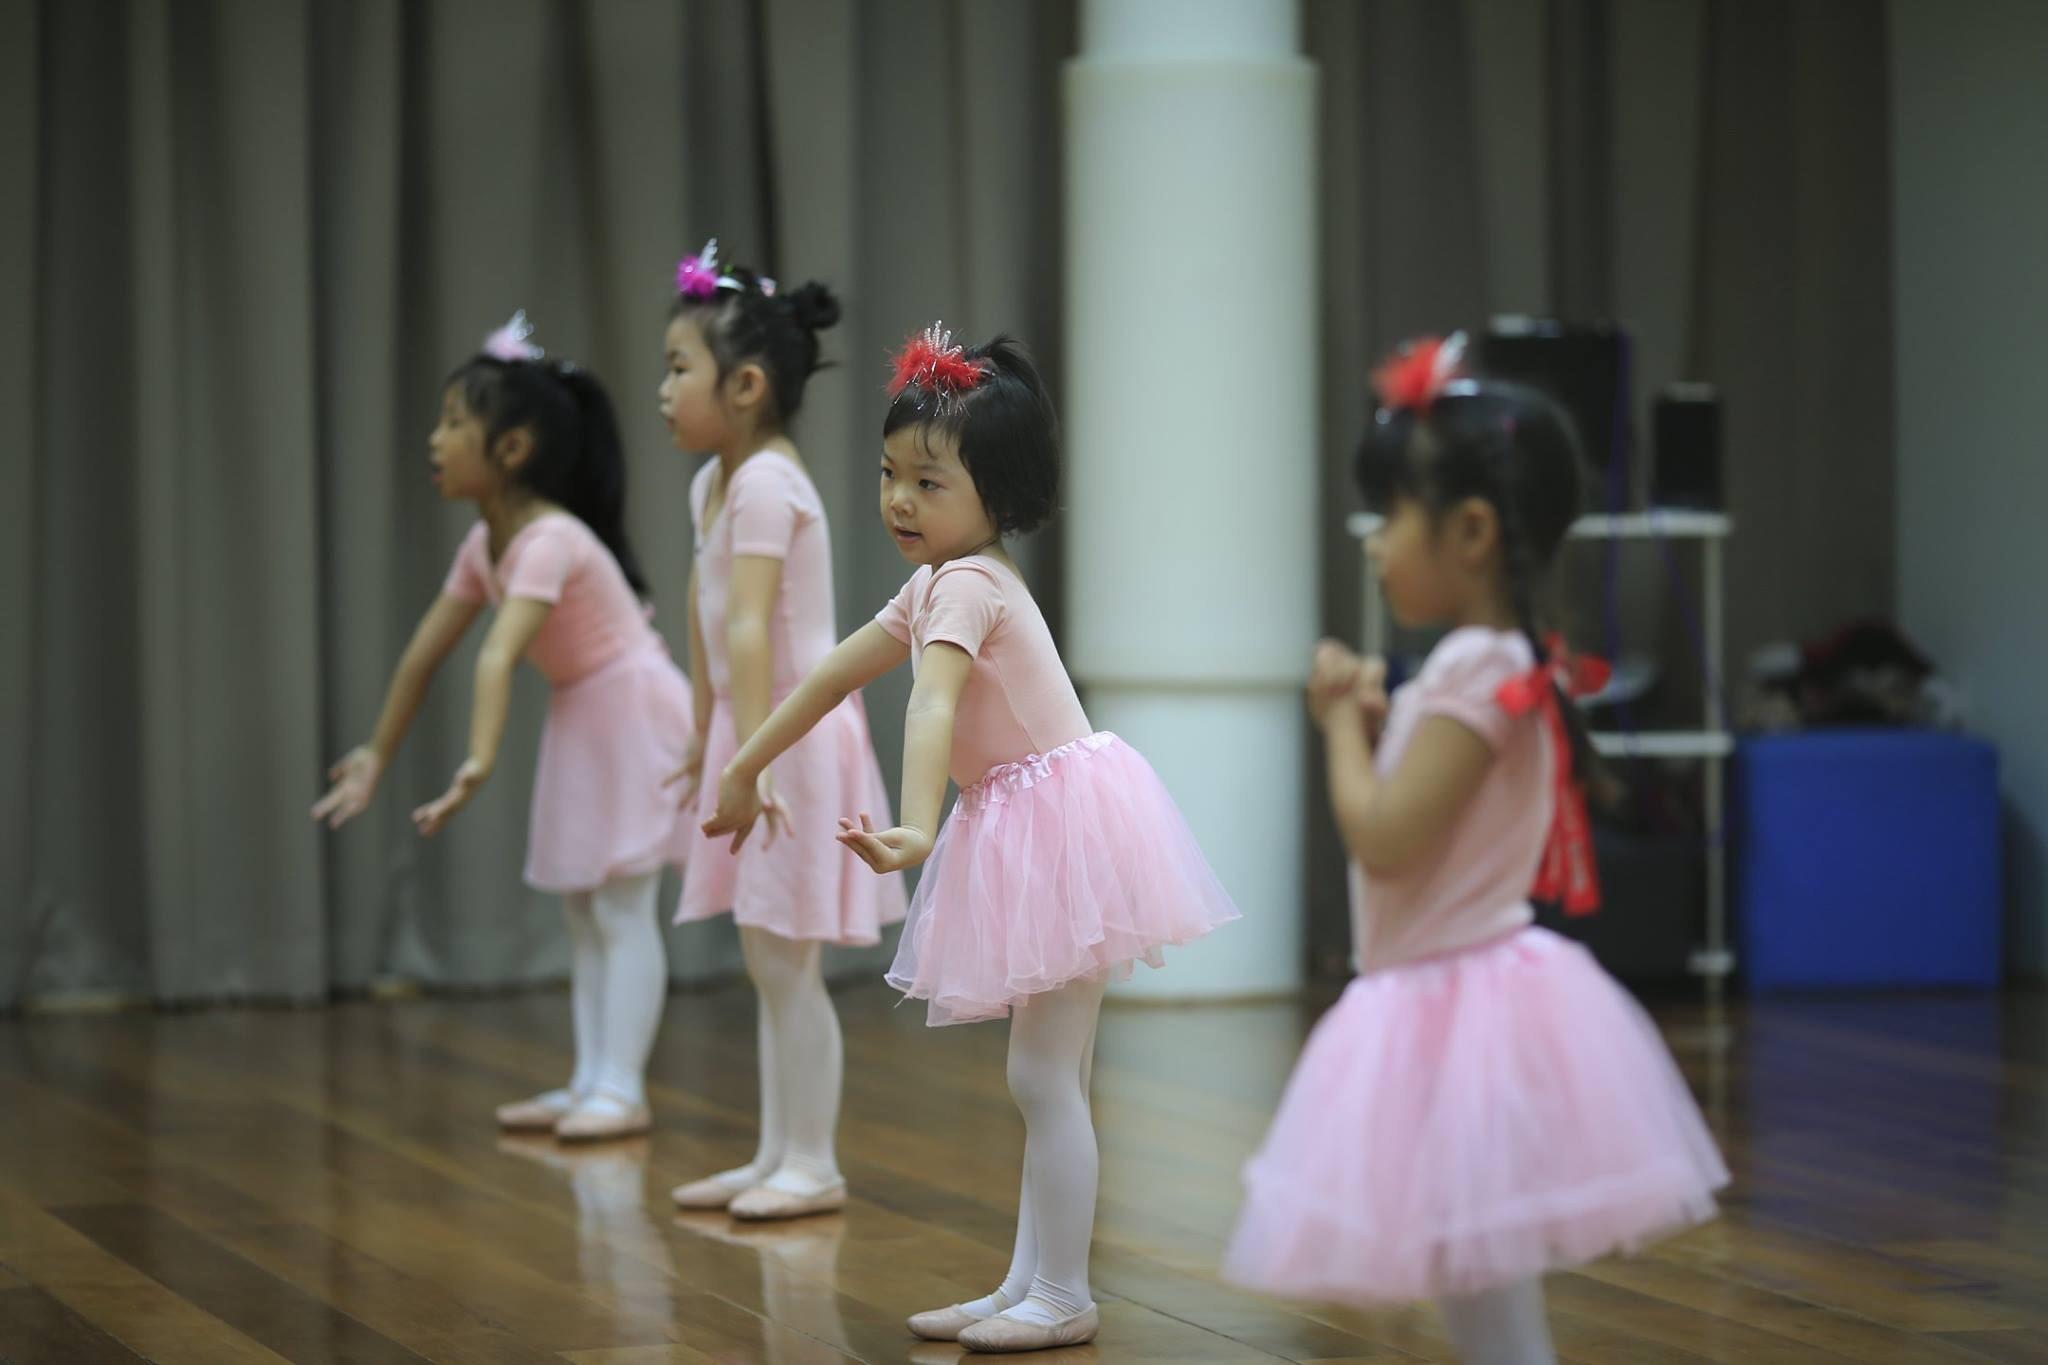 Ballet for kids บัลเล่ต์สำหรับเด็ก สามารถเรียนได้ตั้งแต่อายุ 3 ปีขึ้นไป